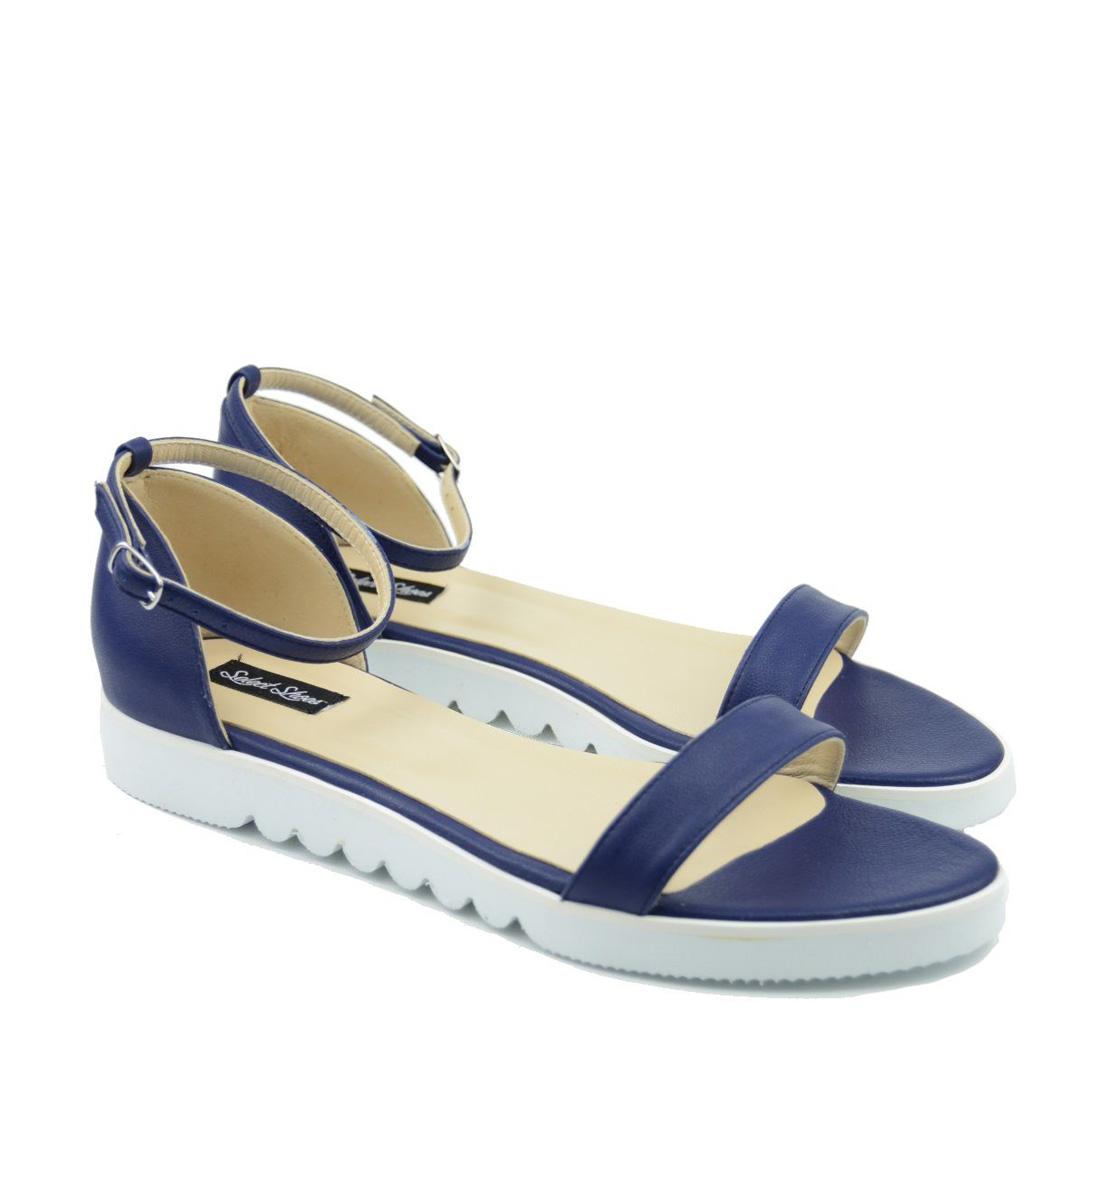 Sandale Albastru Bleumarin Piele Talpa Joasa